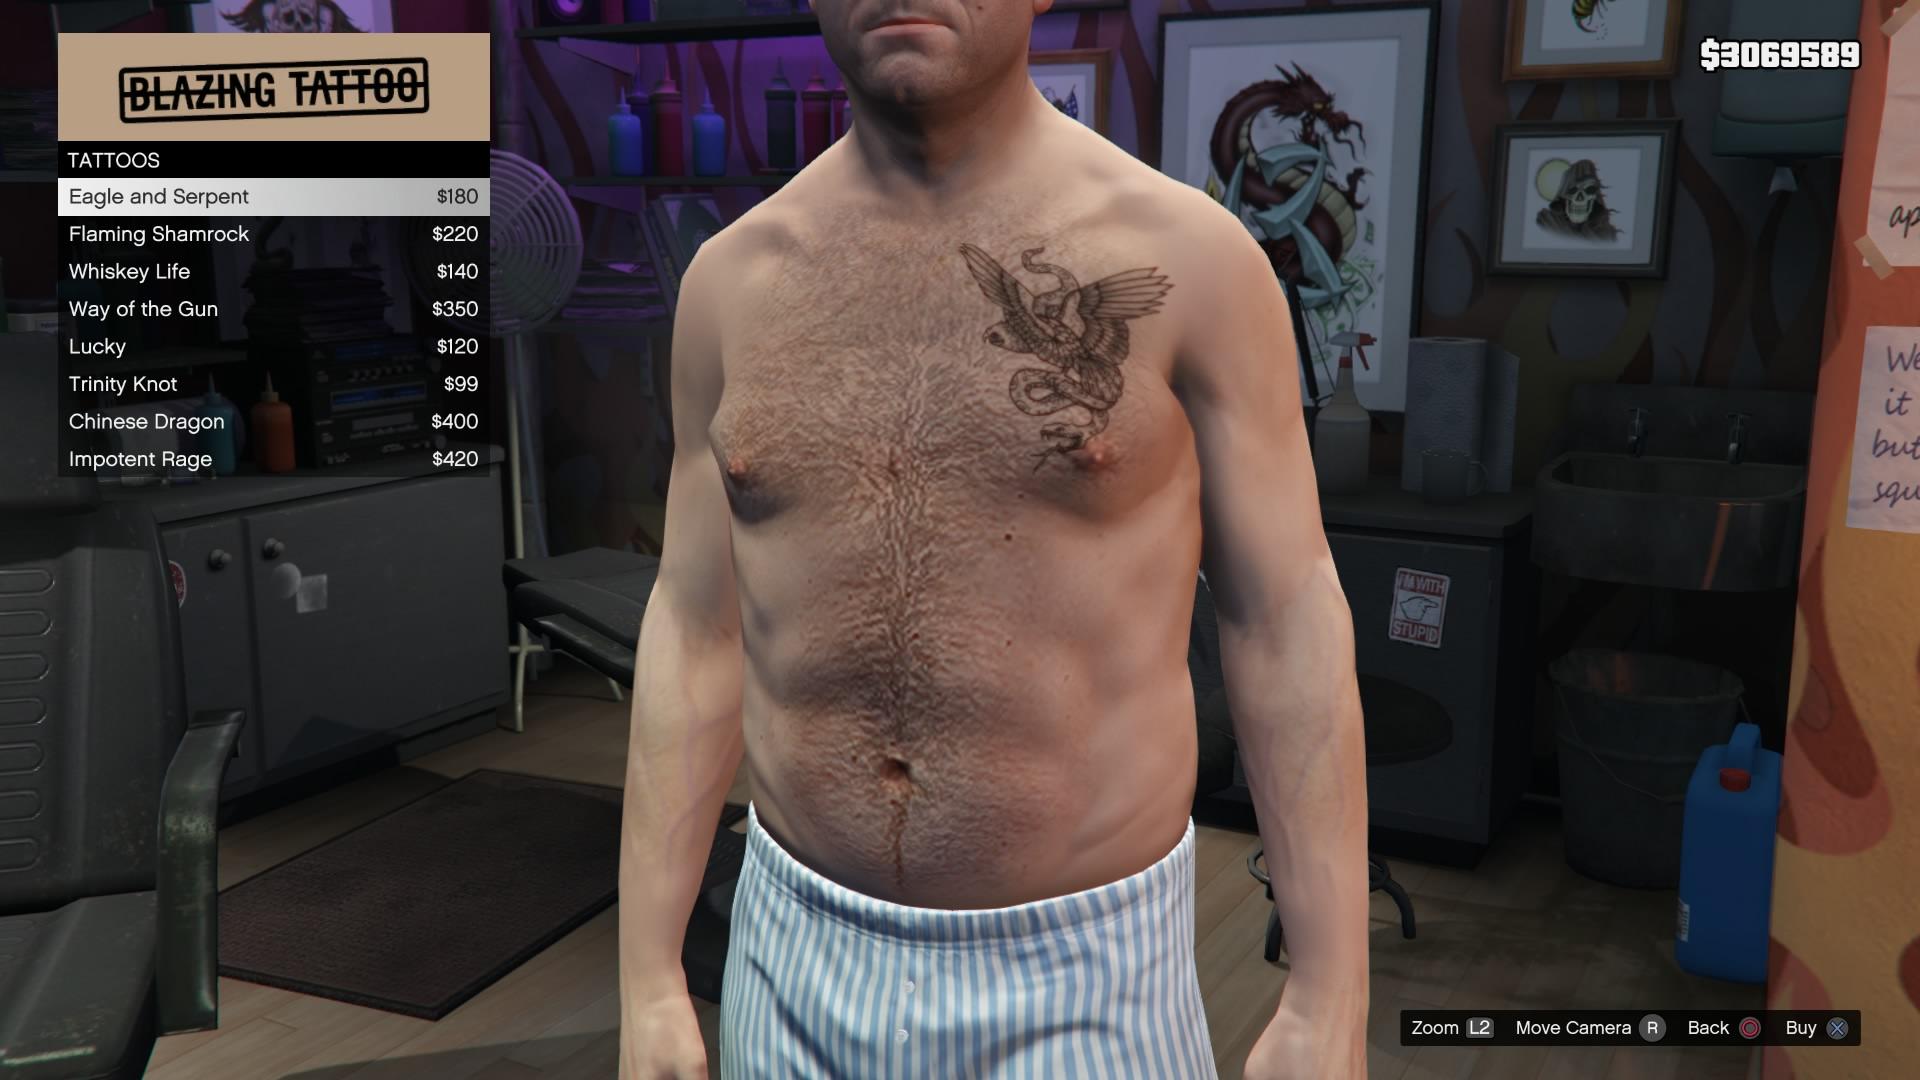 Tattoos frau arm vorlagen